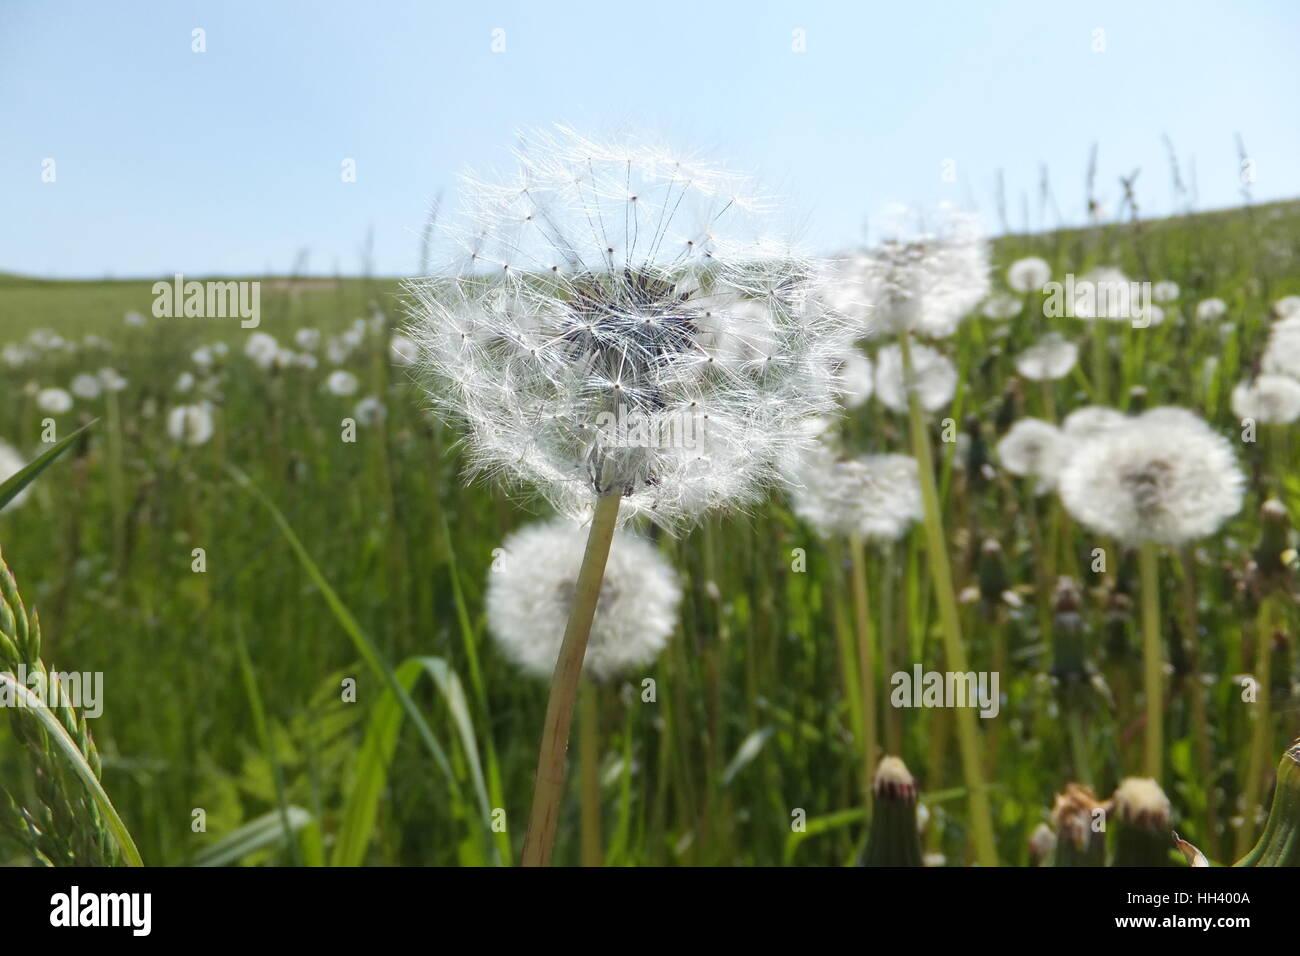 Dandelion fluff flied close-up - Stock Image